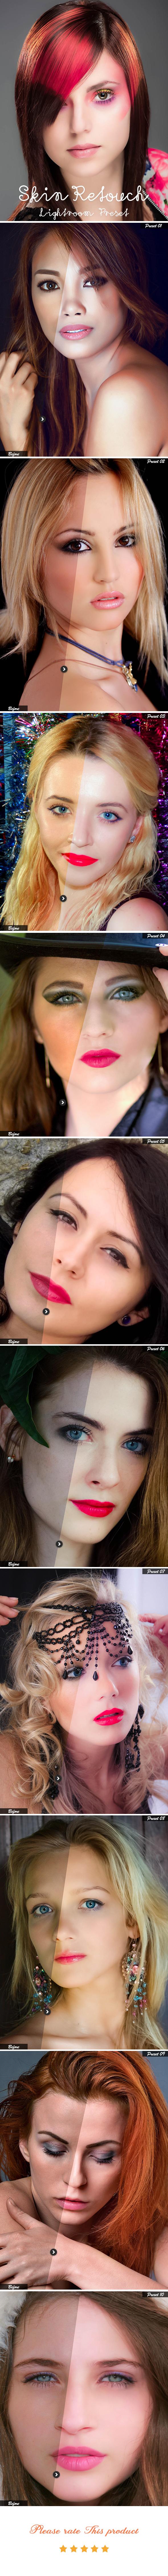 GraphicRiver Skin Retouch Lightroom Preset 20453917